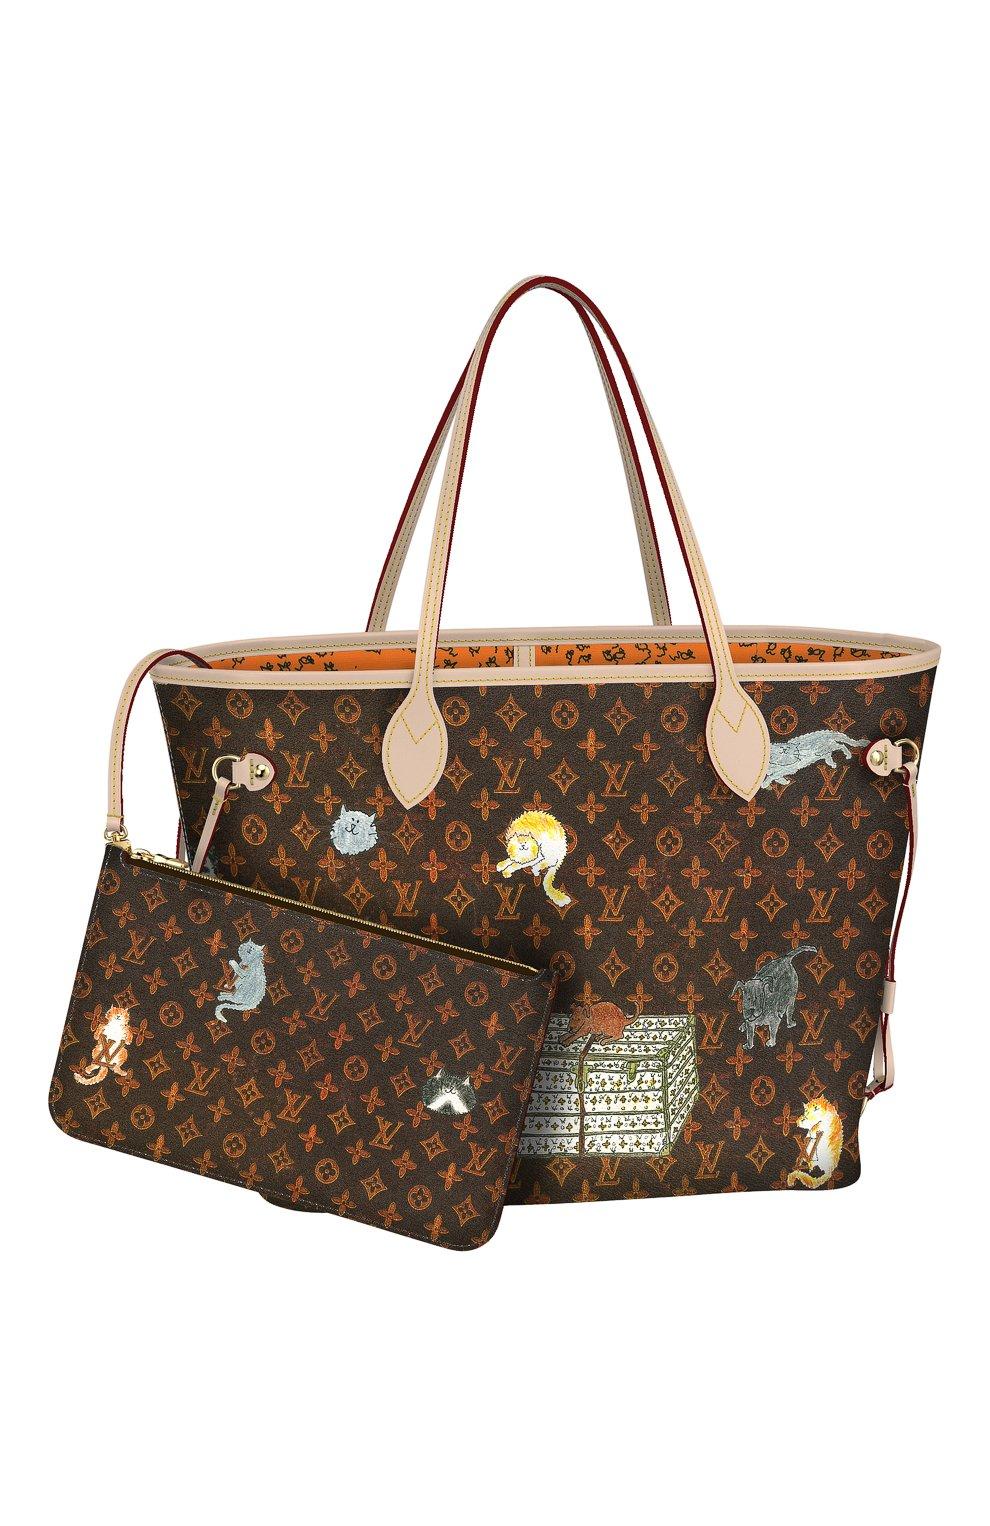 ab6742e1b733 Сумка Neverfull MM с принтом Catogram Louis Vuitton коричневая цвета | Фото  №1